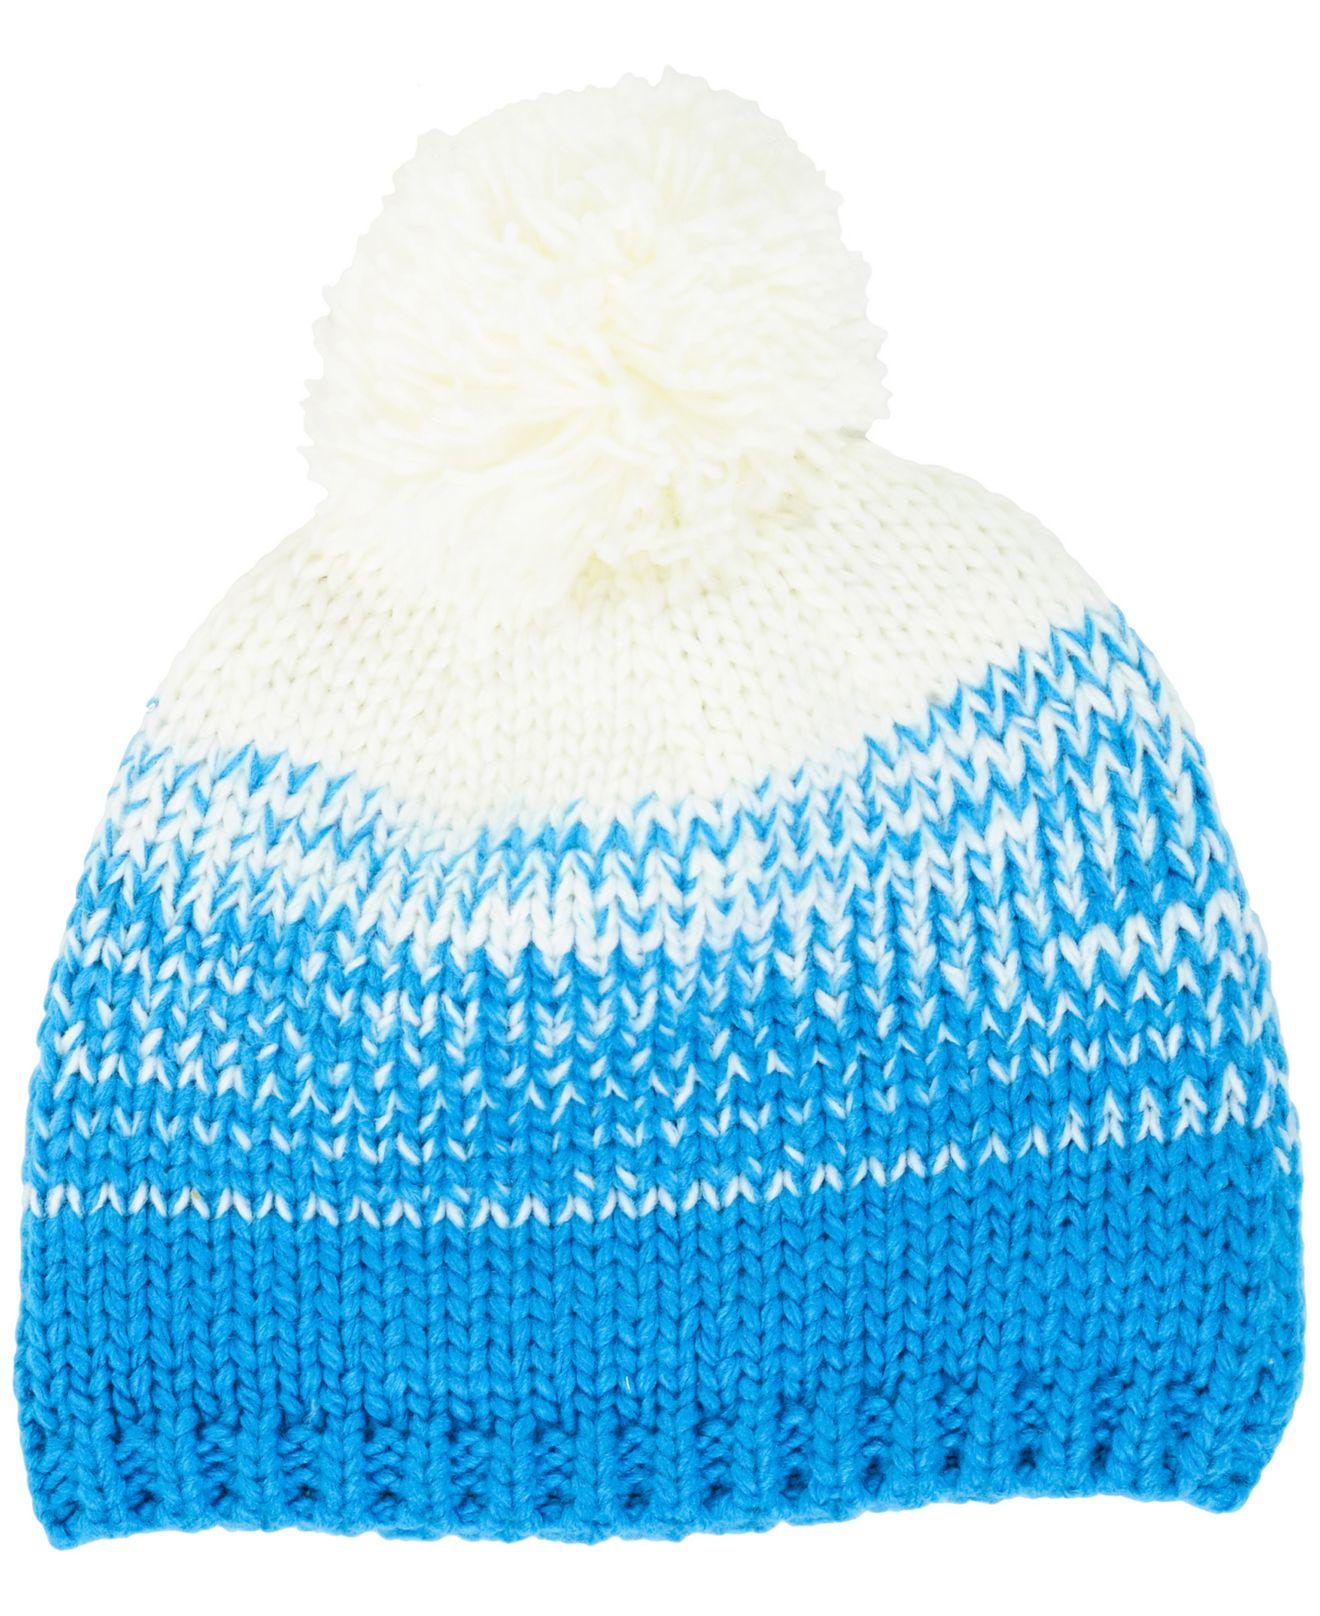 Lyst - KTZ Women s Carolina Panthers Polar Dust Knit Hat in White 4a5c25ce40